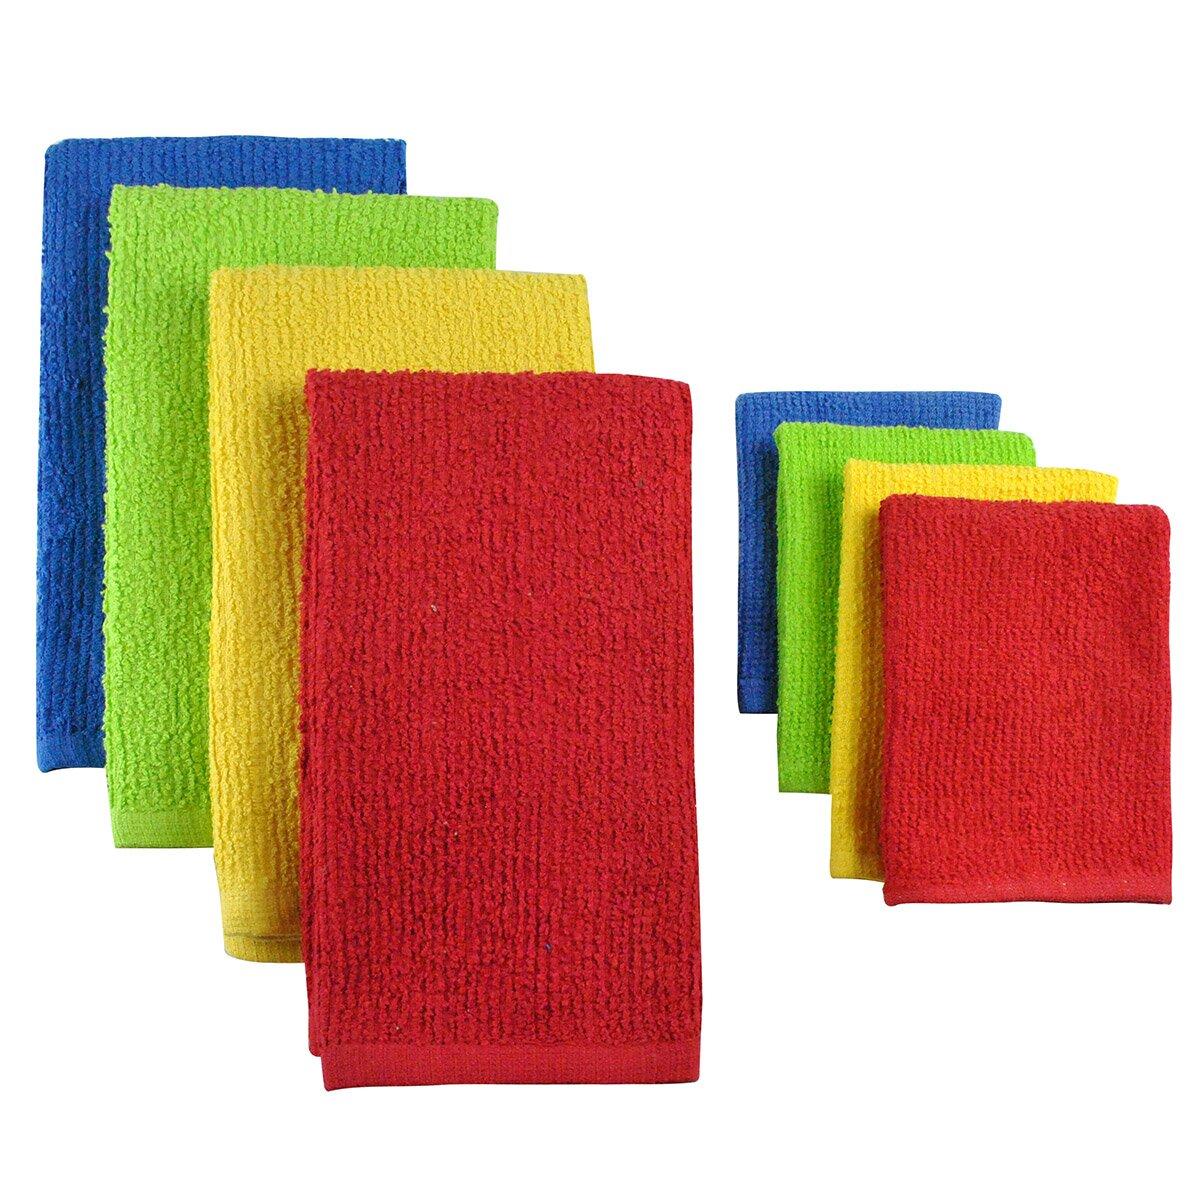 Dish Towel In: Design Imports 8 Piece Terry Bar Mop Dish Towel & Dish